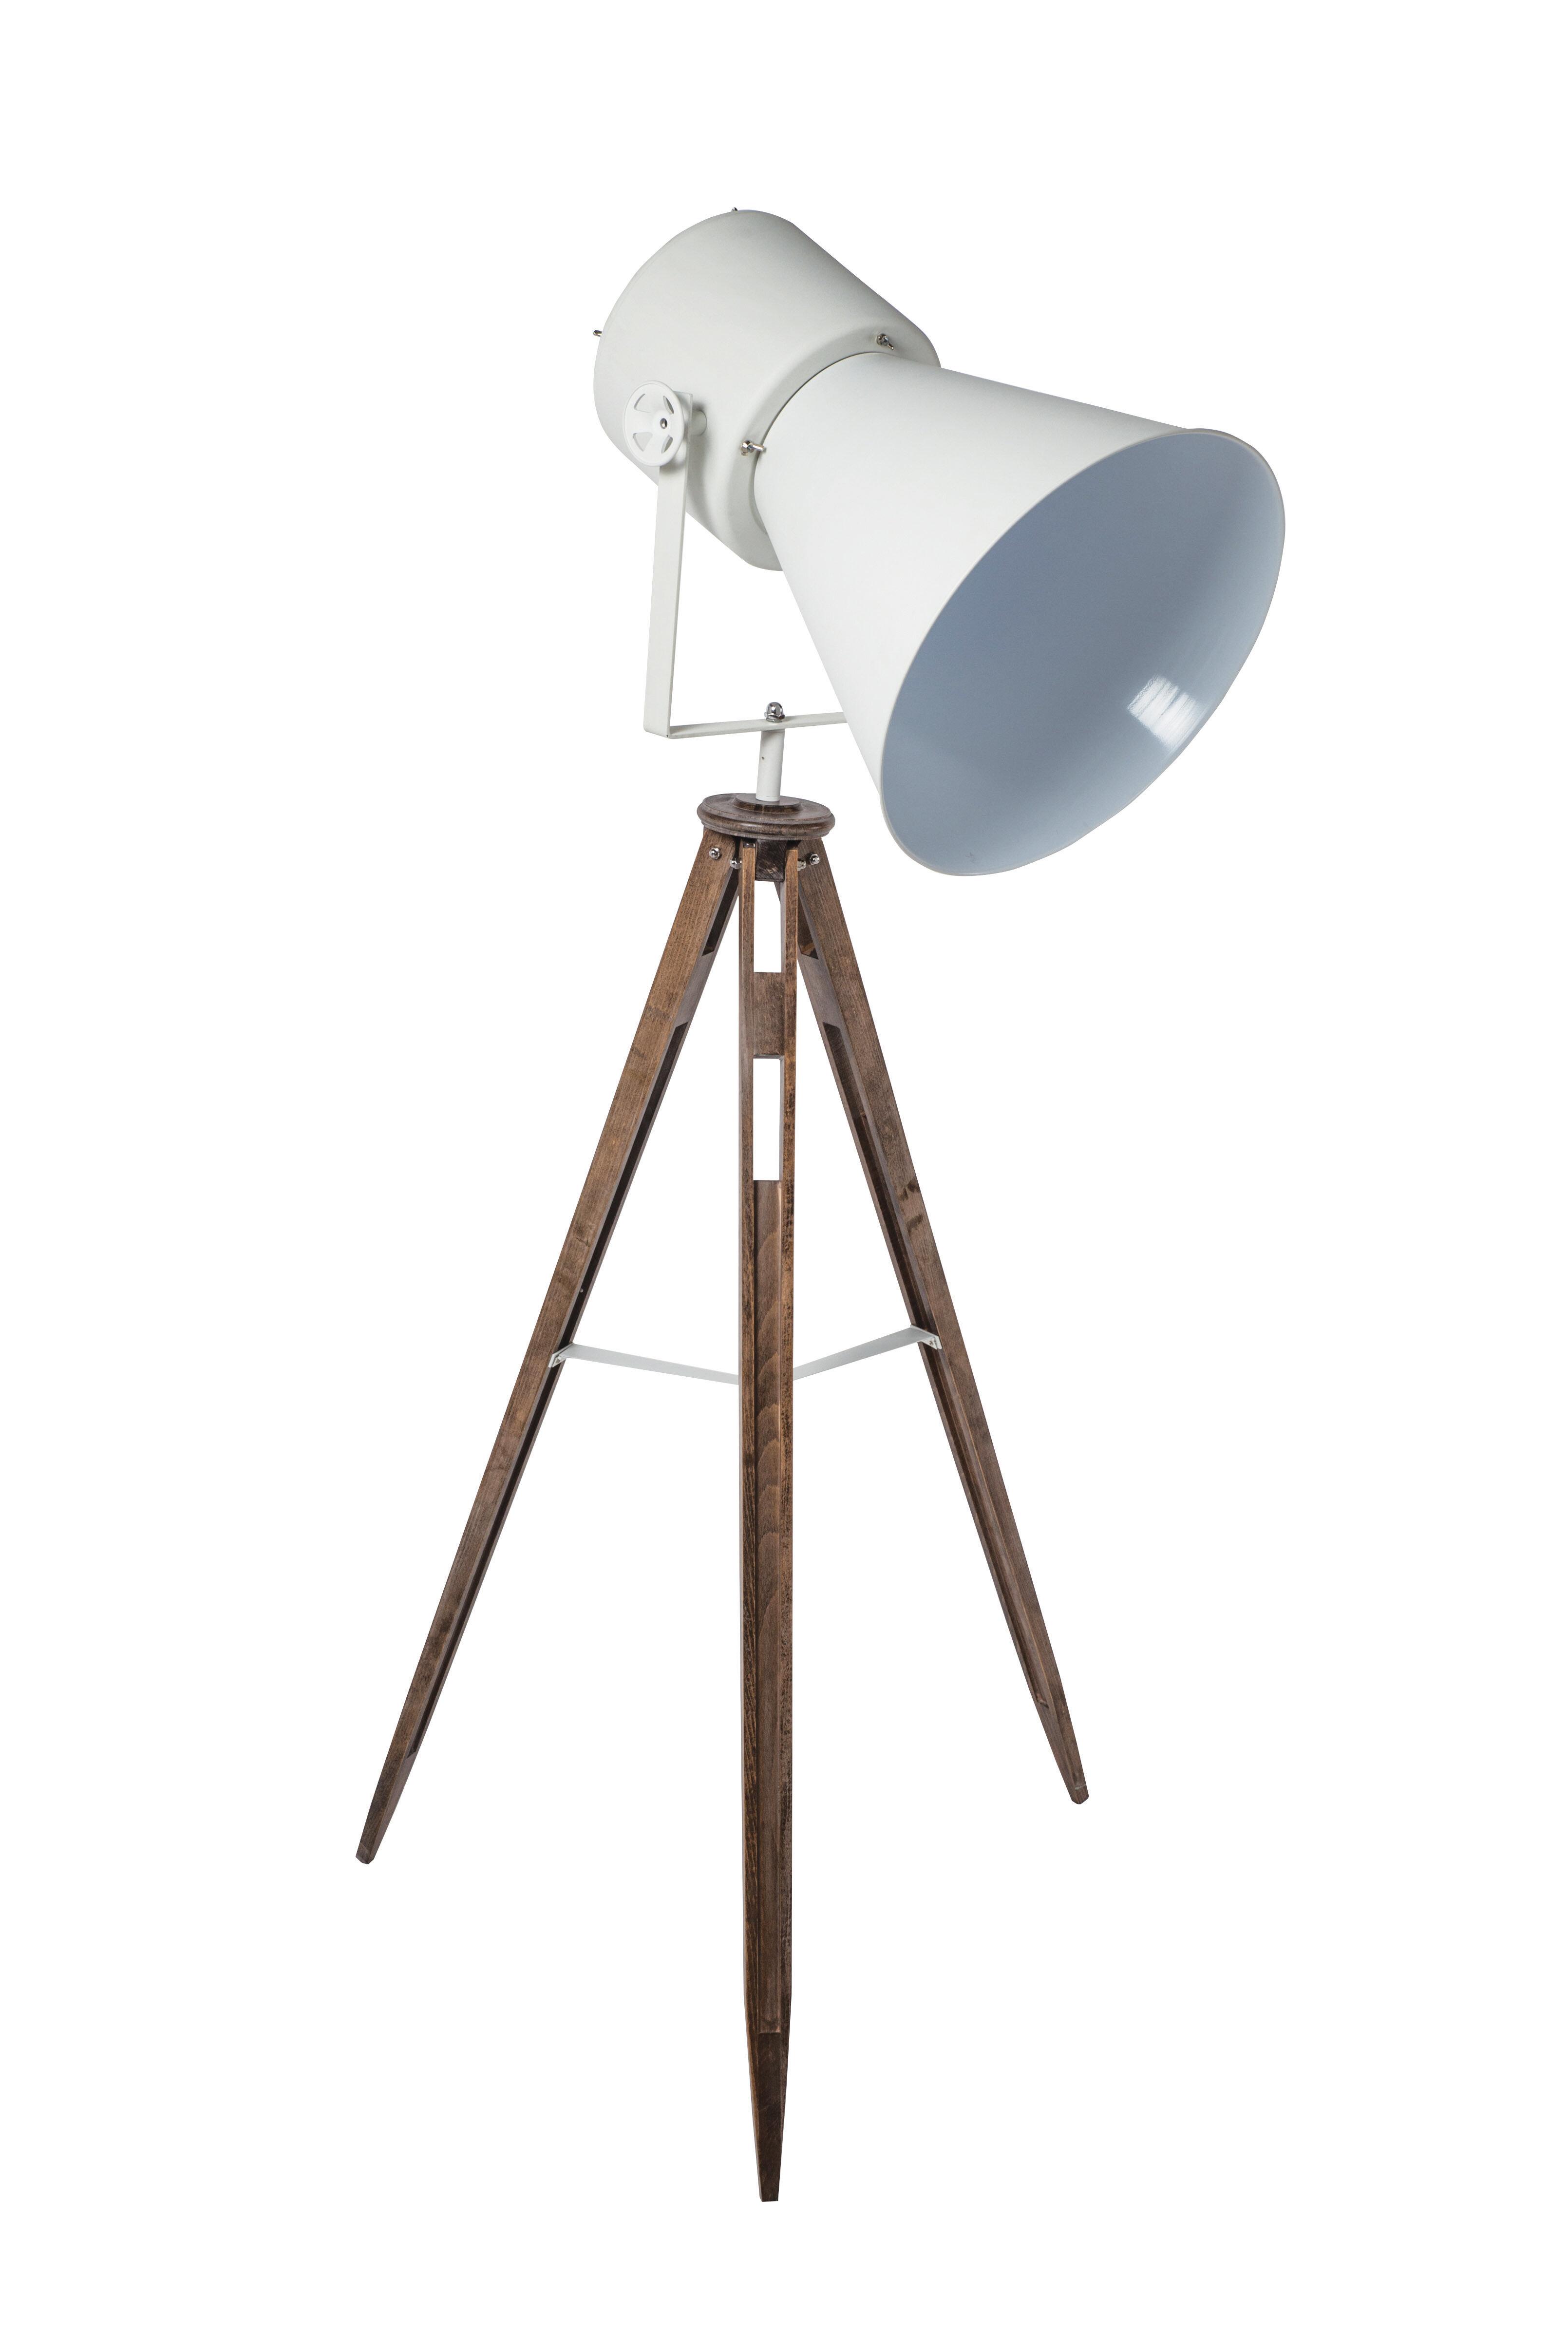 Williston Forge 170 Cm Tripod Stehlampe Cleckheat Wayfair De